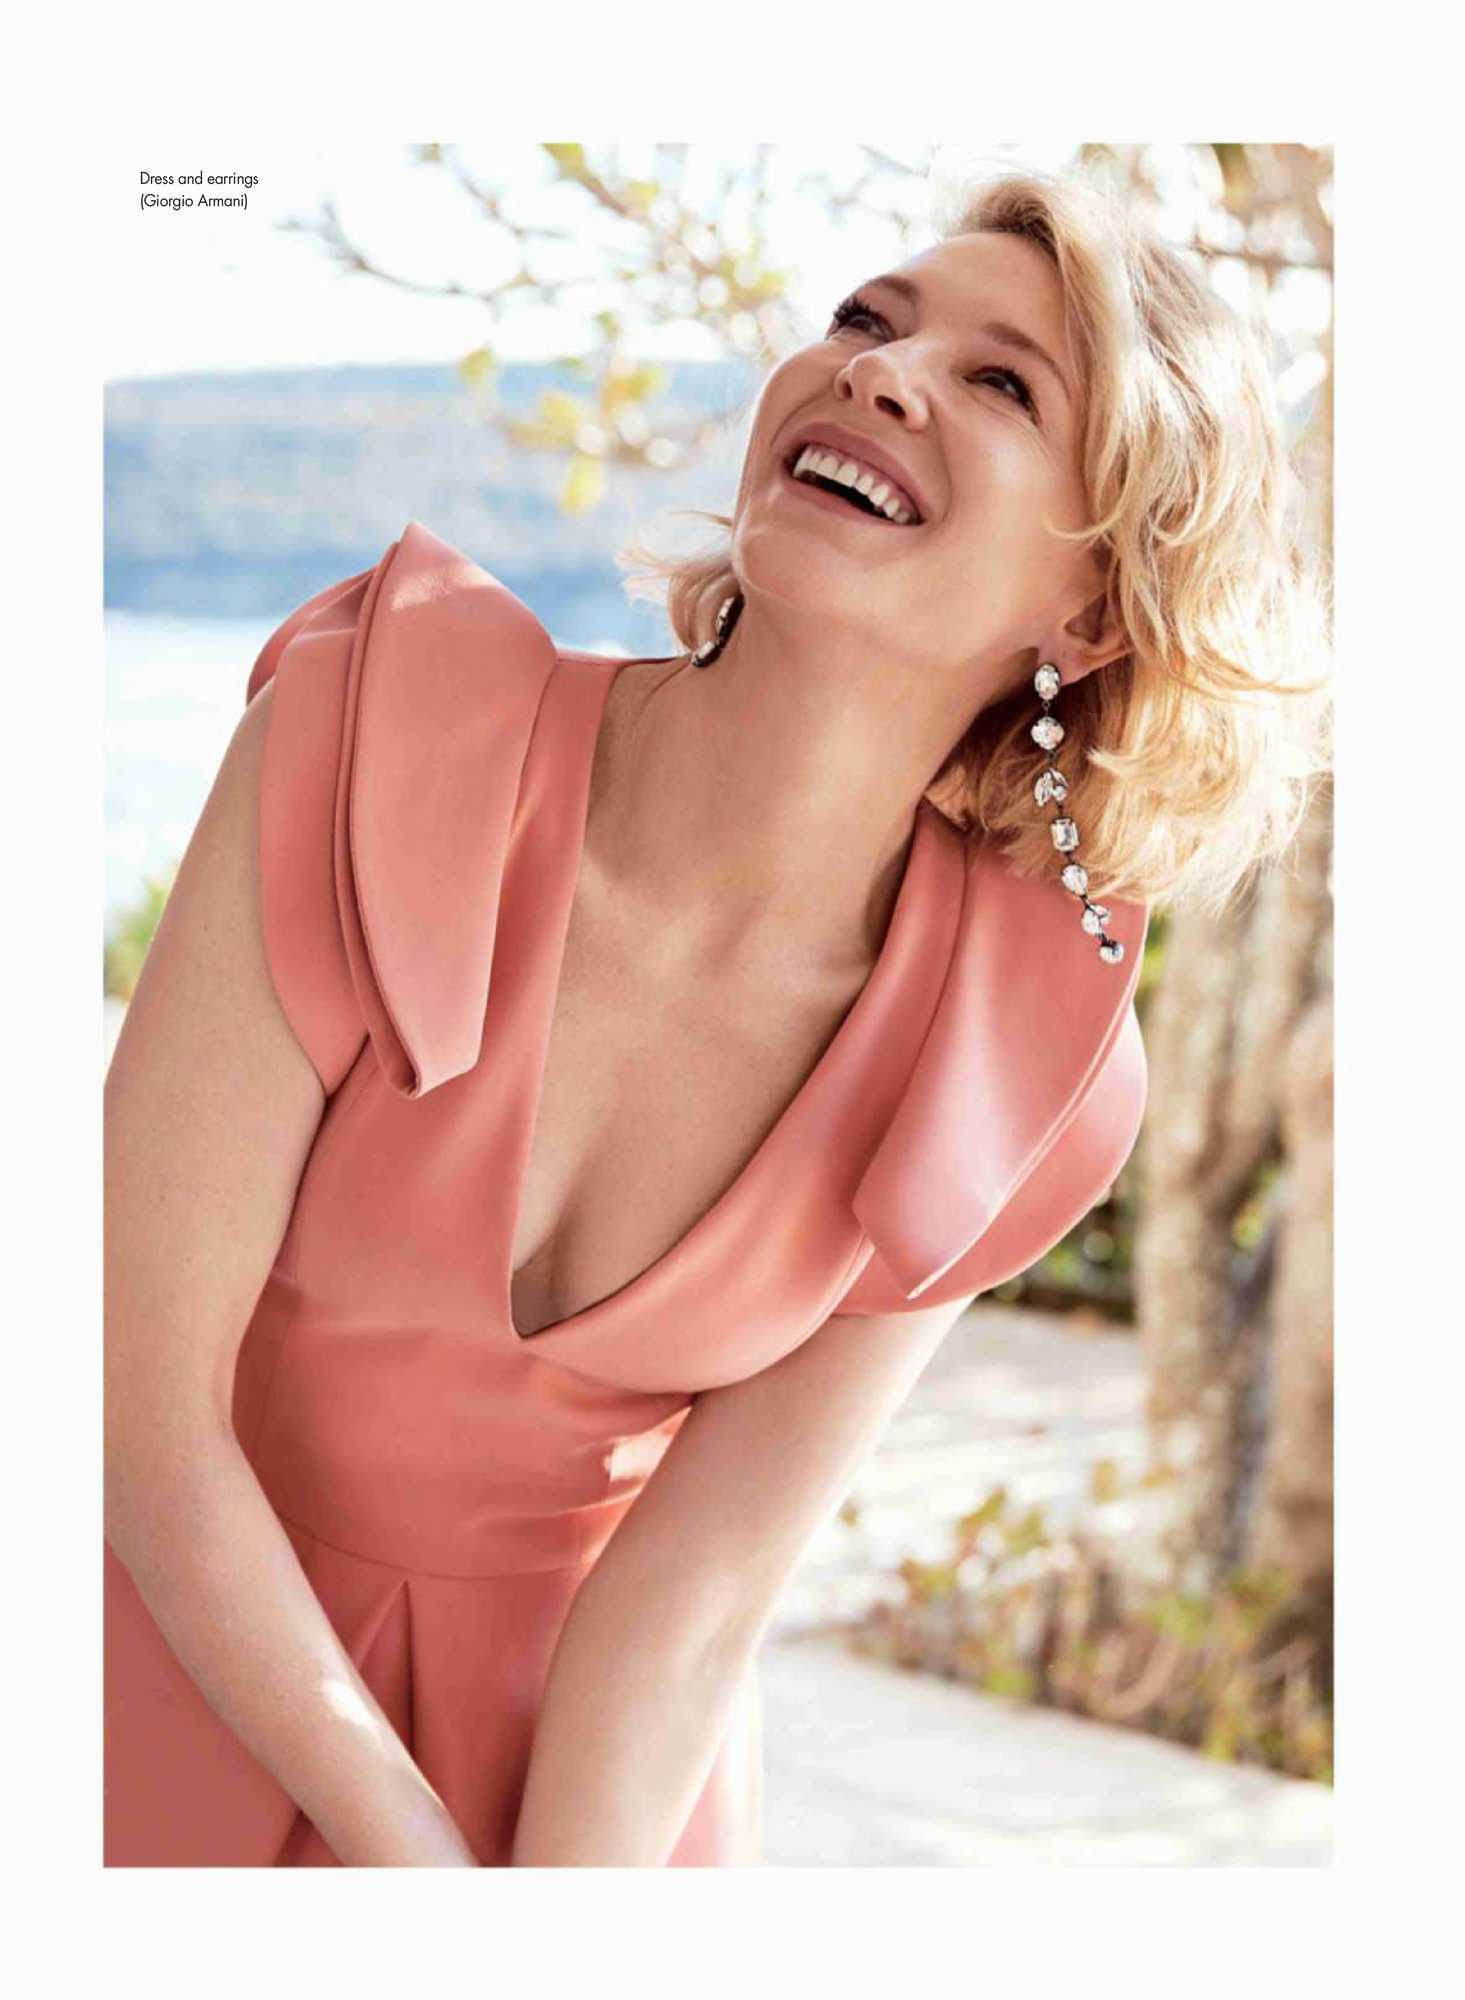 Cate-Blanchett-Elle-Canada-December-2018c3d5d01024005994.jpg